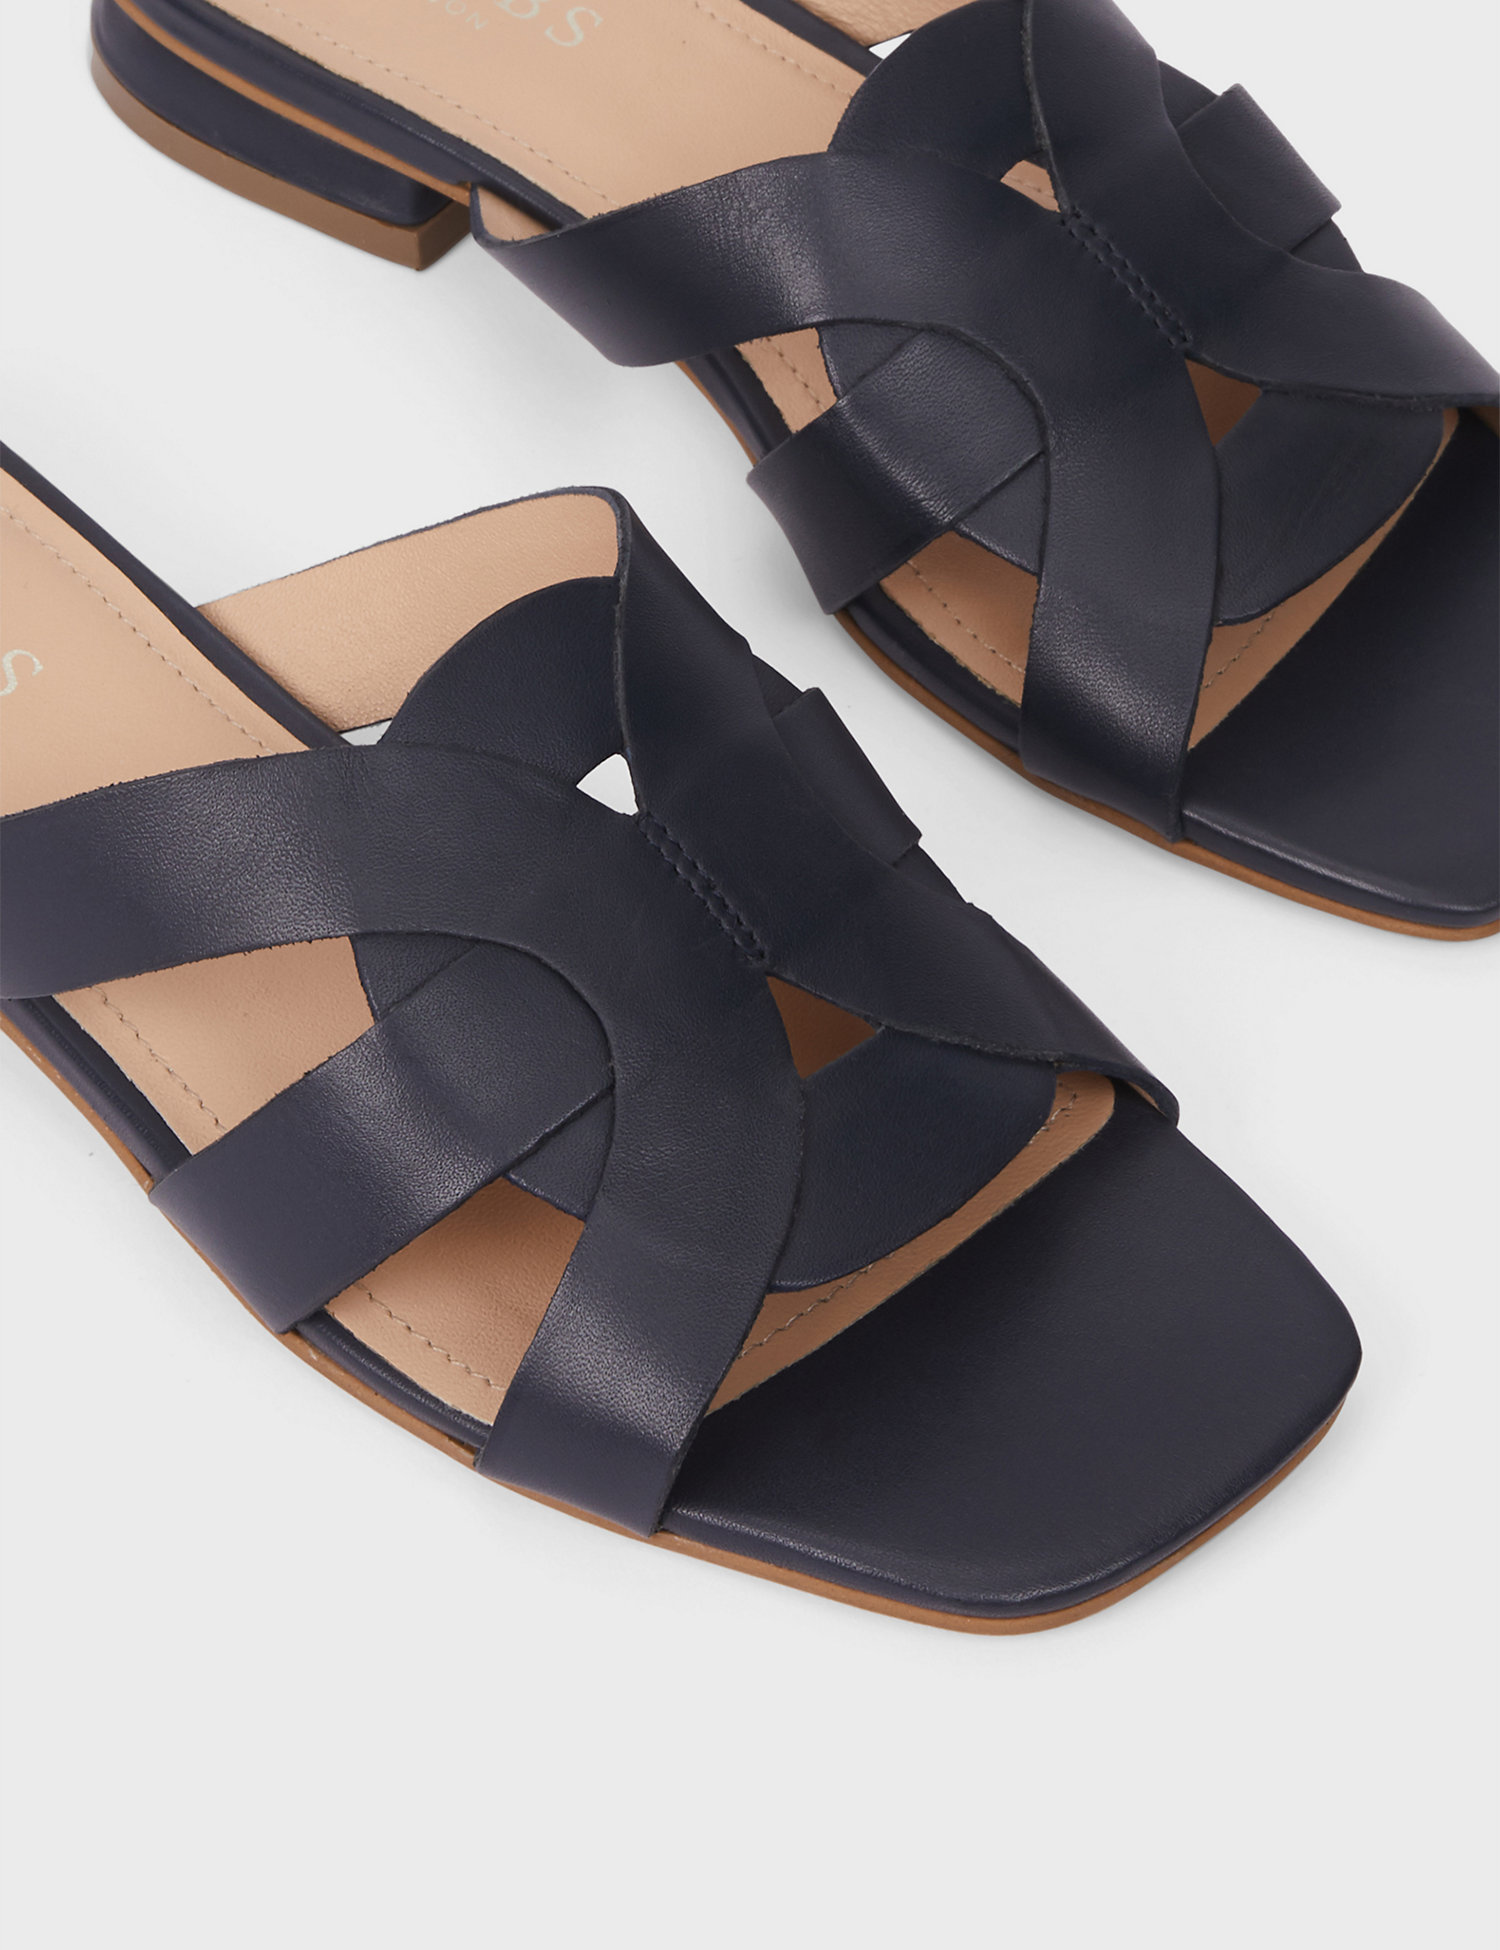 Leather Flat Sliders in black HOBBS at m&s